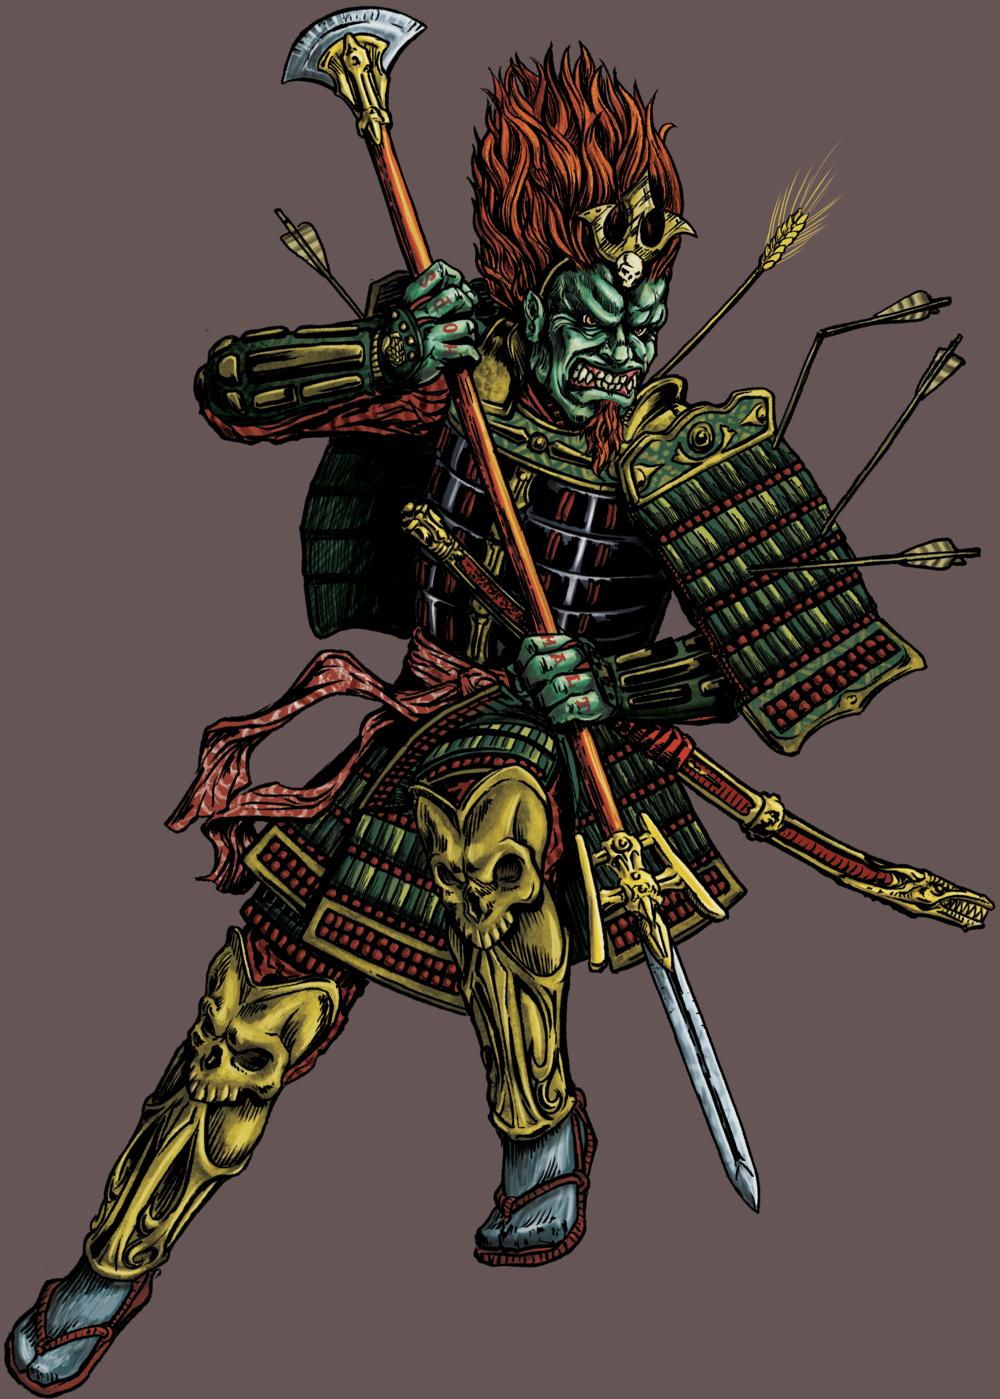 Alpha King Character Illustration